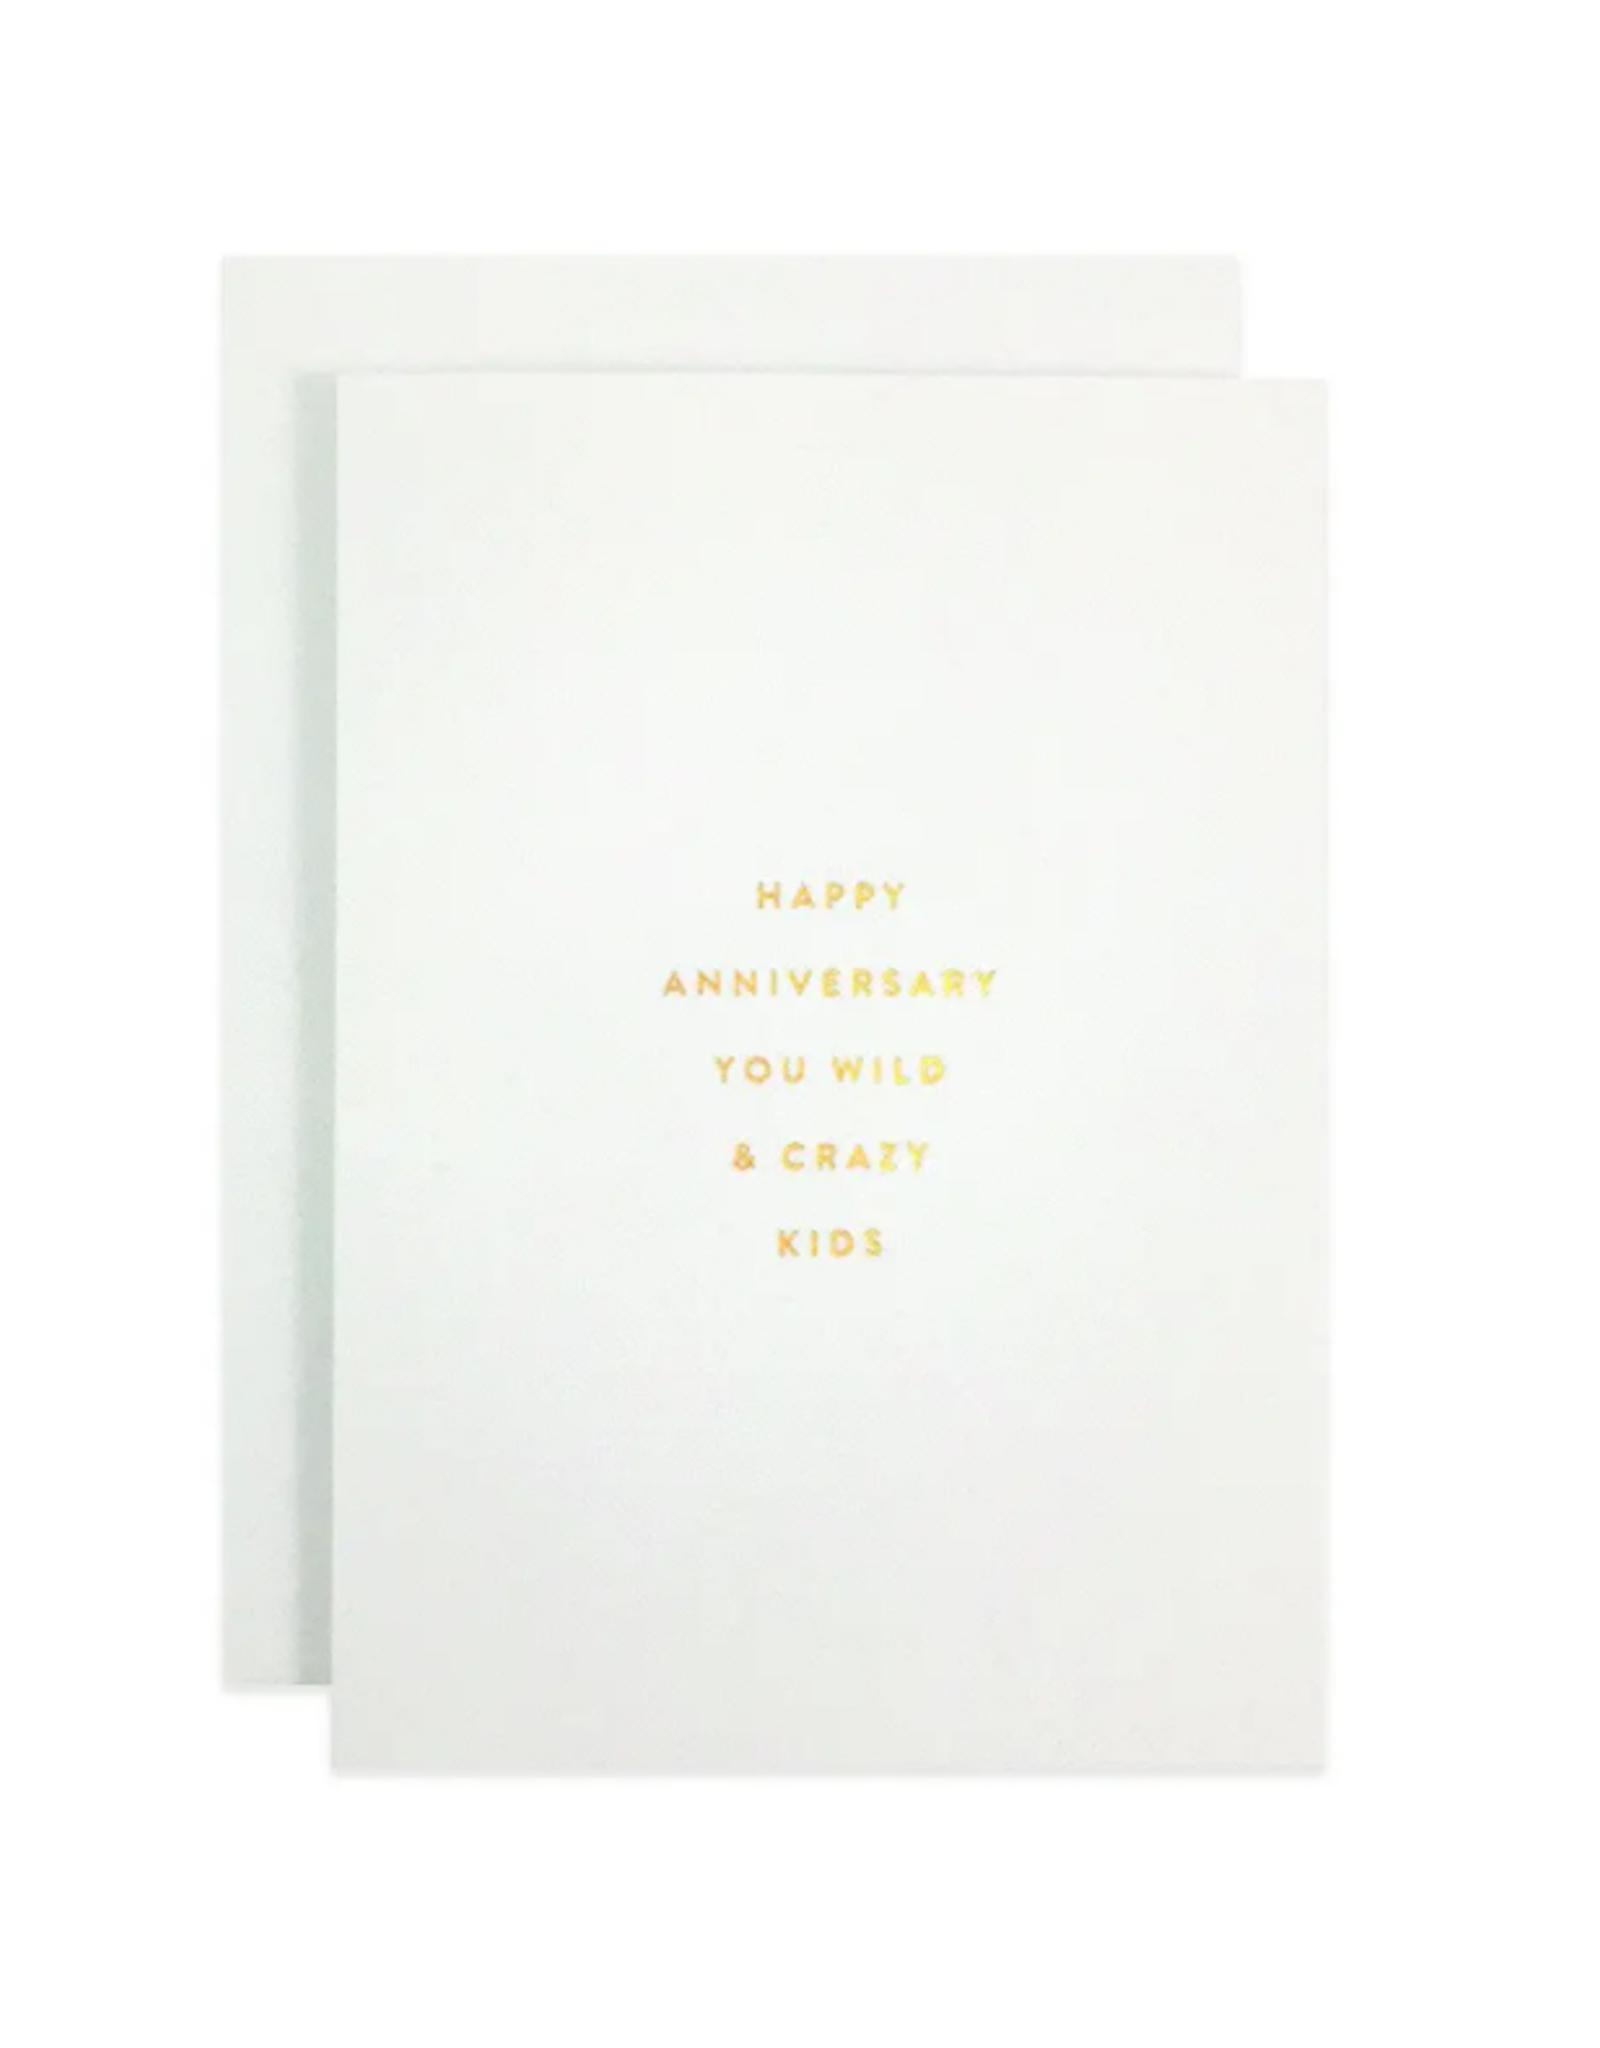 Crazy Kids Anniversary Card